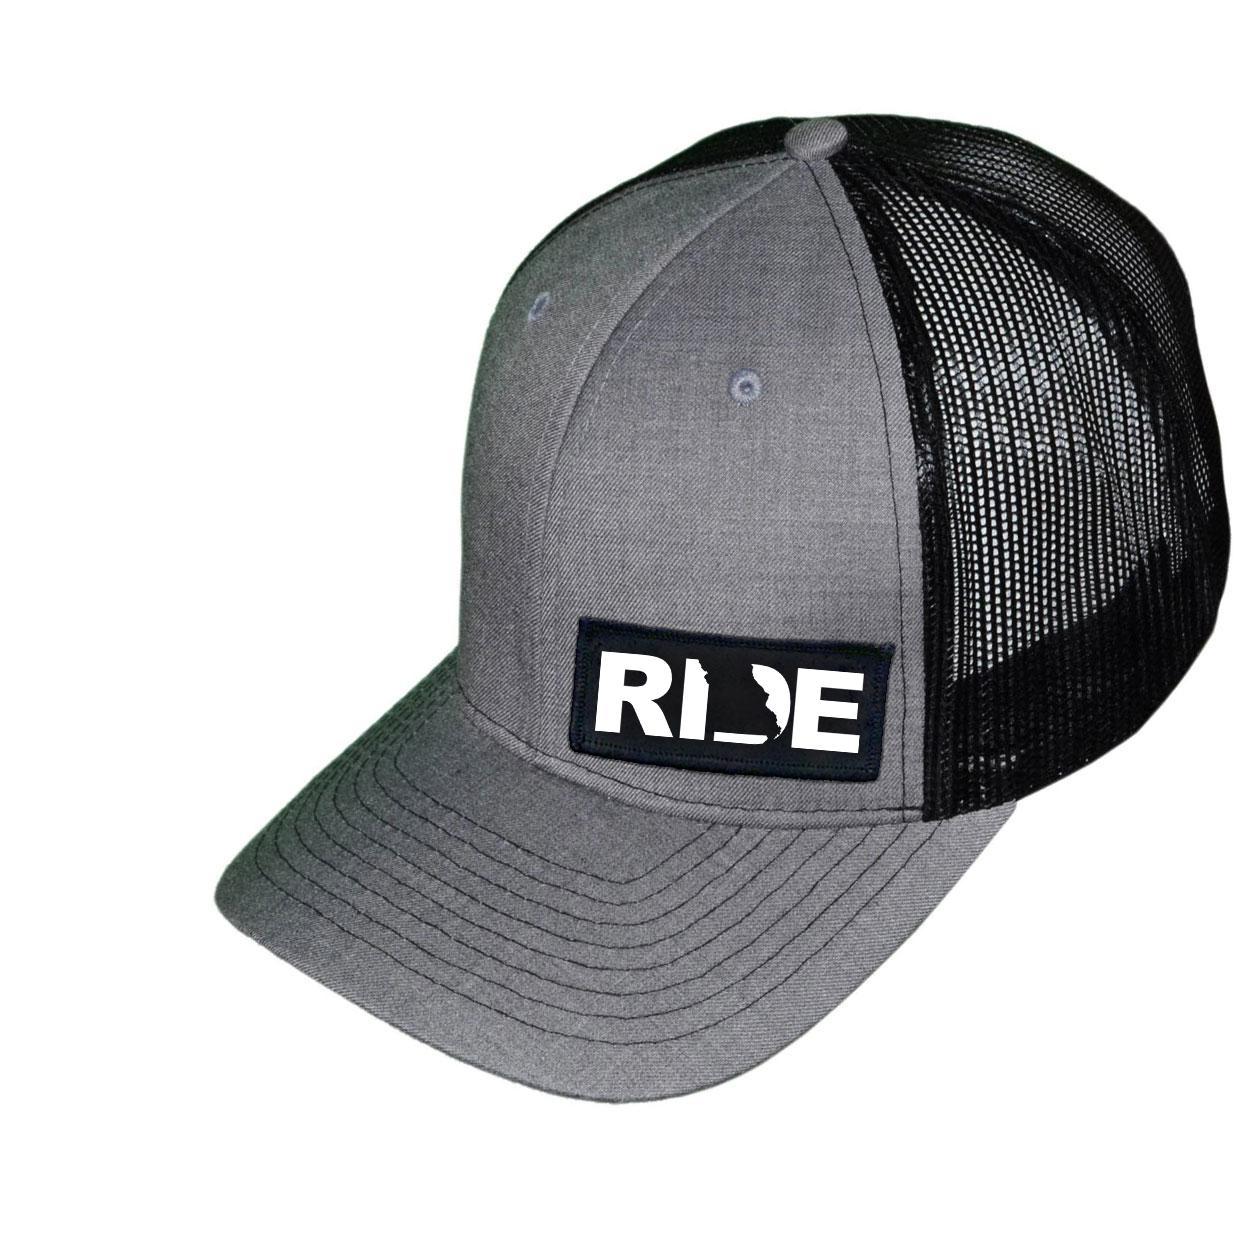 Ride Missouri Night Out Woven Patch Snapback Trucker Hat Heather Gray/Black (White Logo)